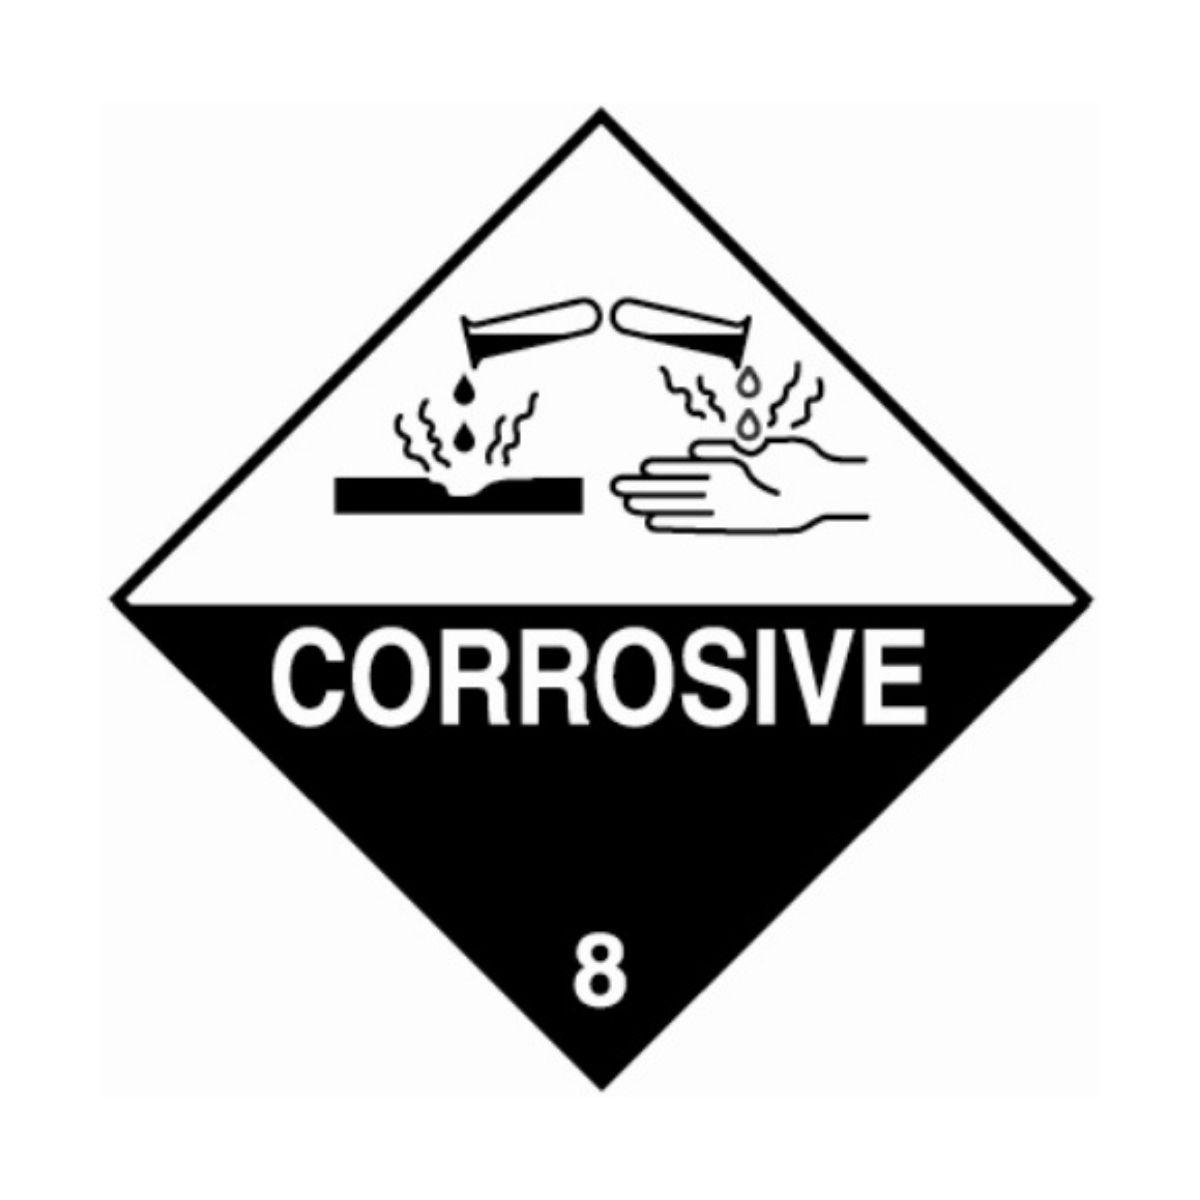 HD1810 UN Hazard Warning Diamond Class 8 Corrosive